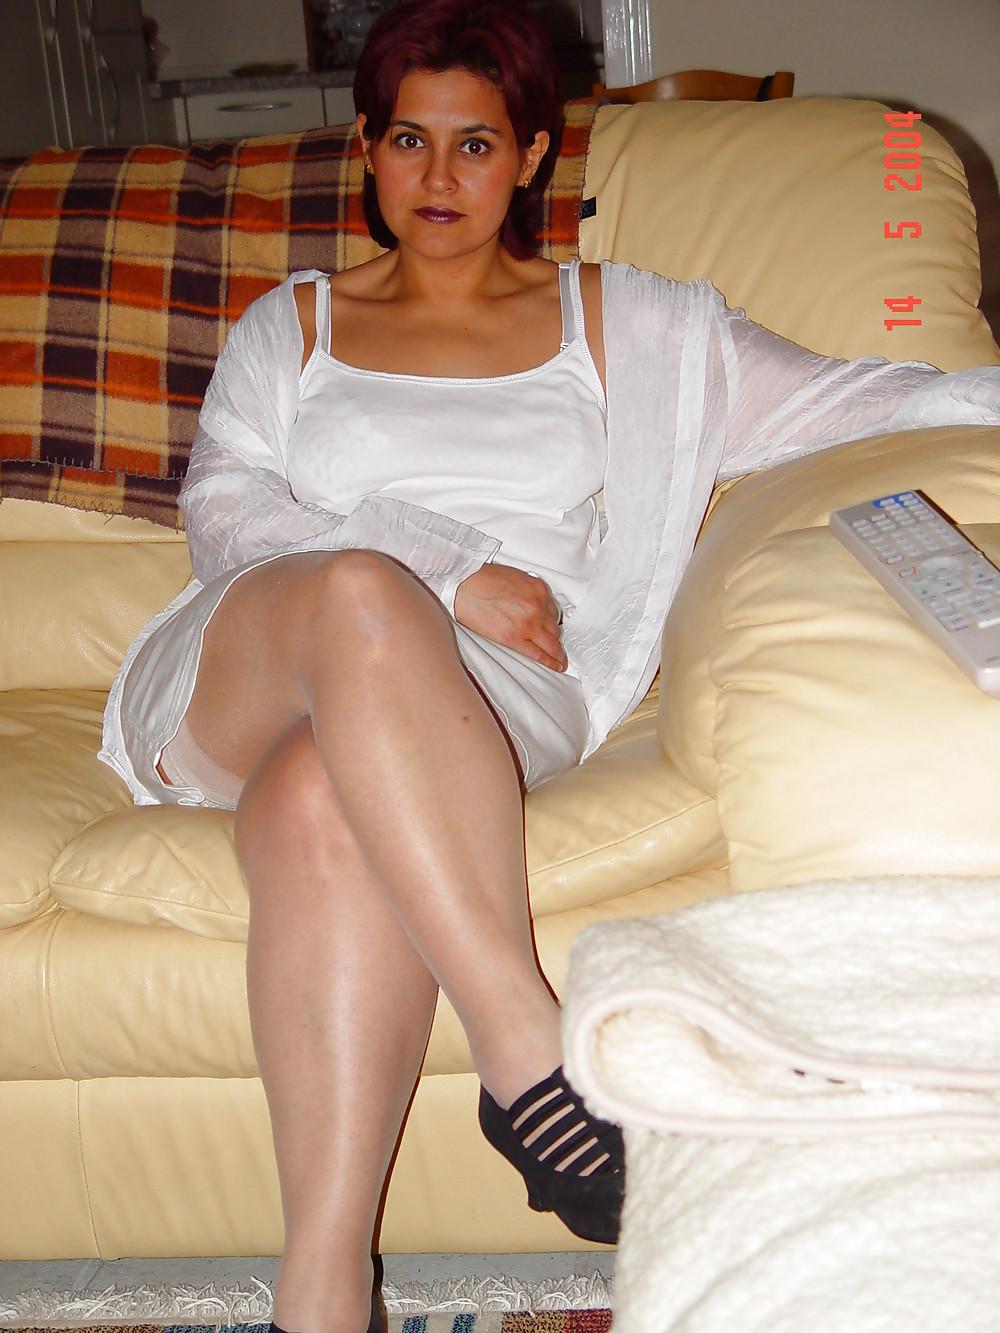 amature-wife-in-adult-cinema-older-age-bikini-models